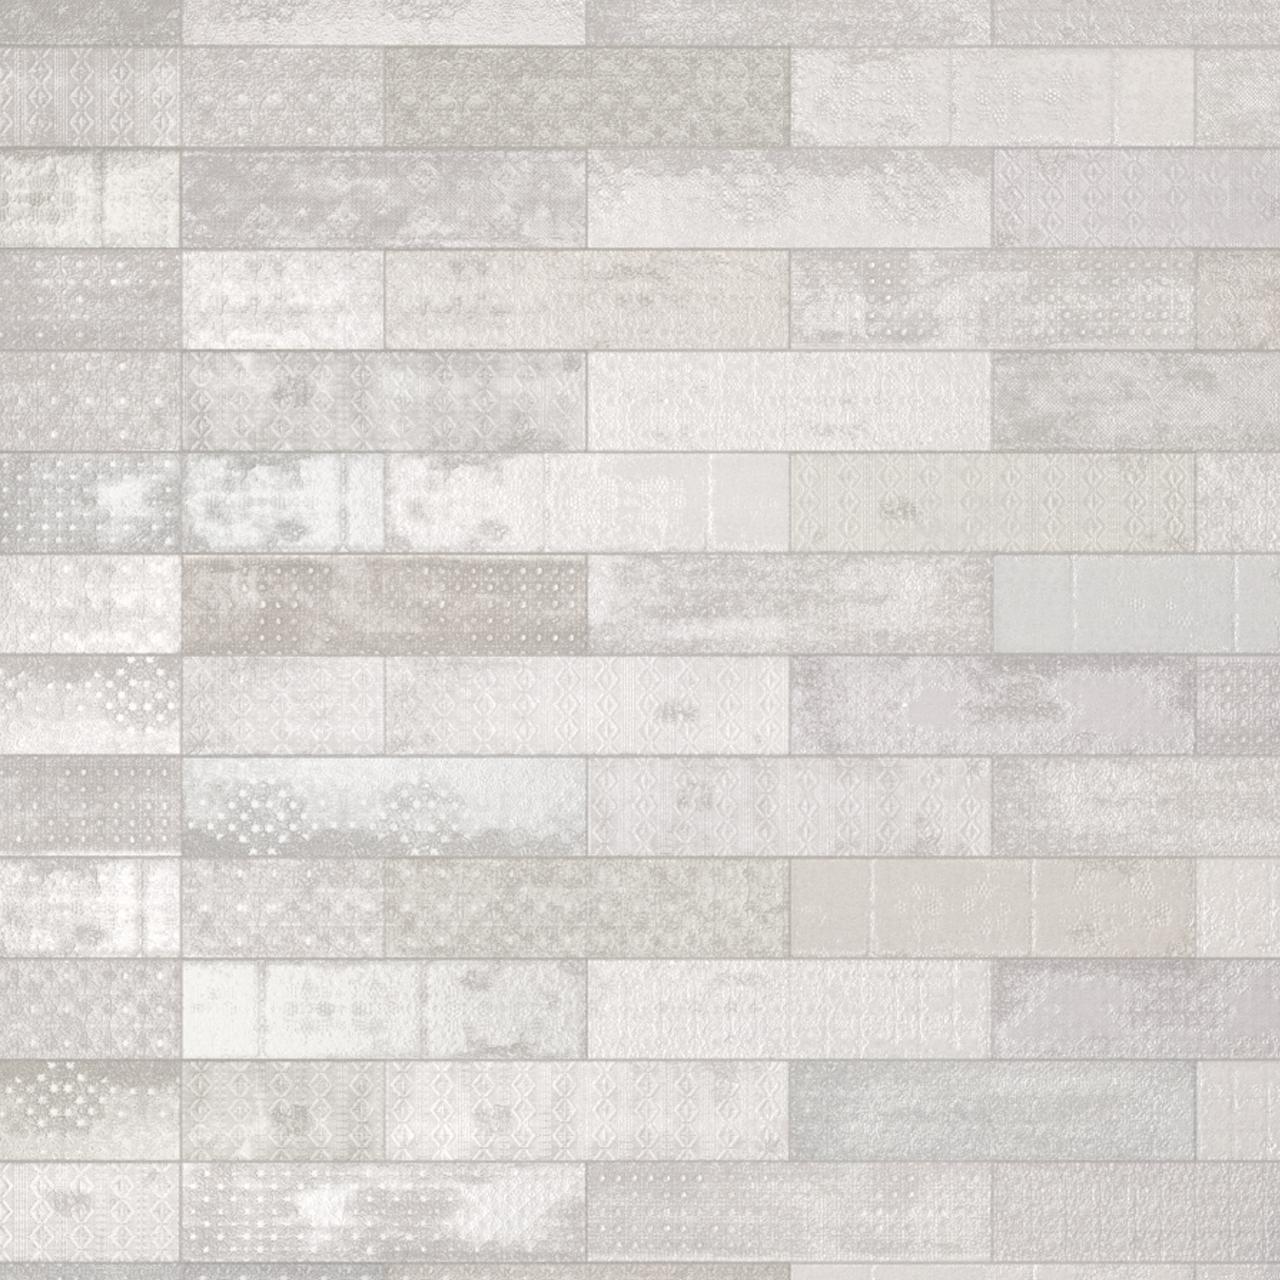 render-3d-de-detalle-de-ceramica-con-efecto-relieve-reflectante